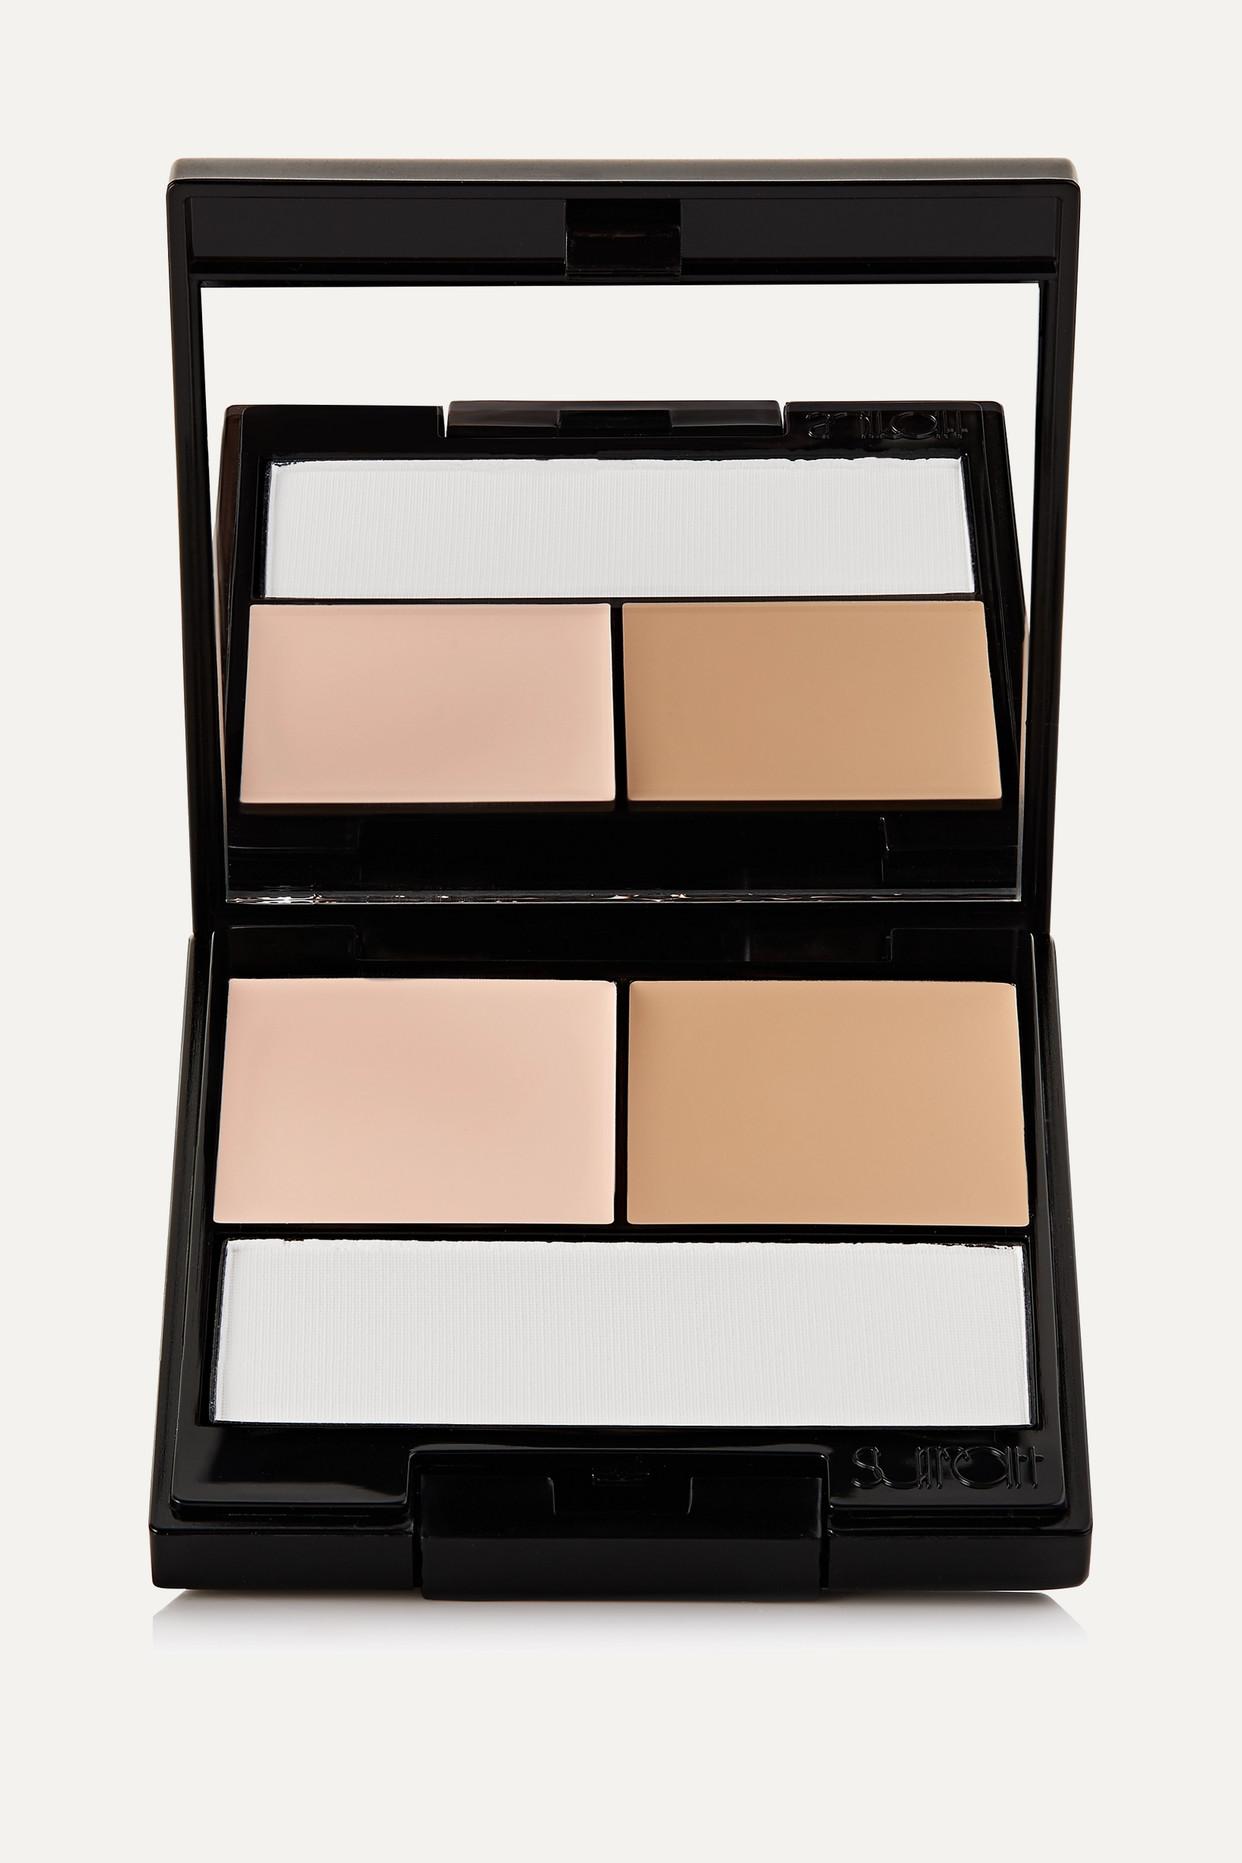 SURRATT BEAUTY - Perfectionniste Concealer Palette - Shade 1 - Neutrals - one size